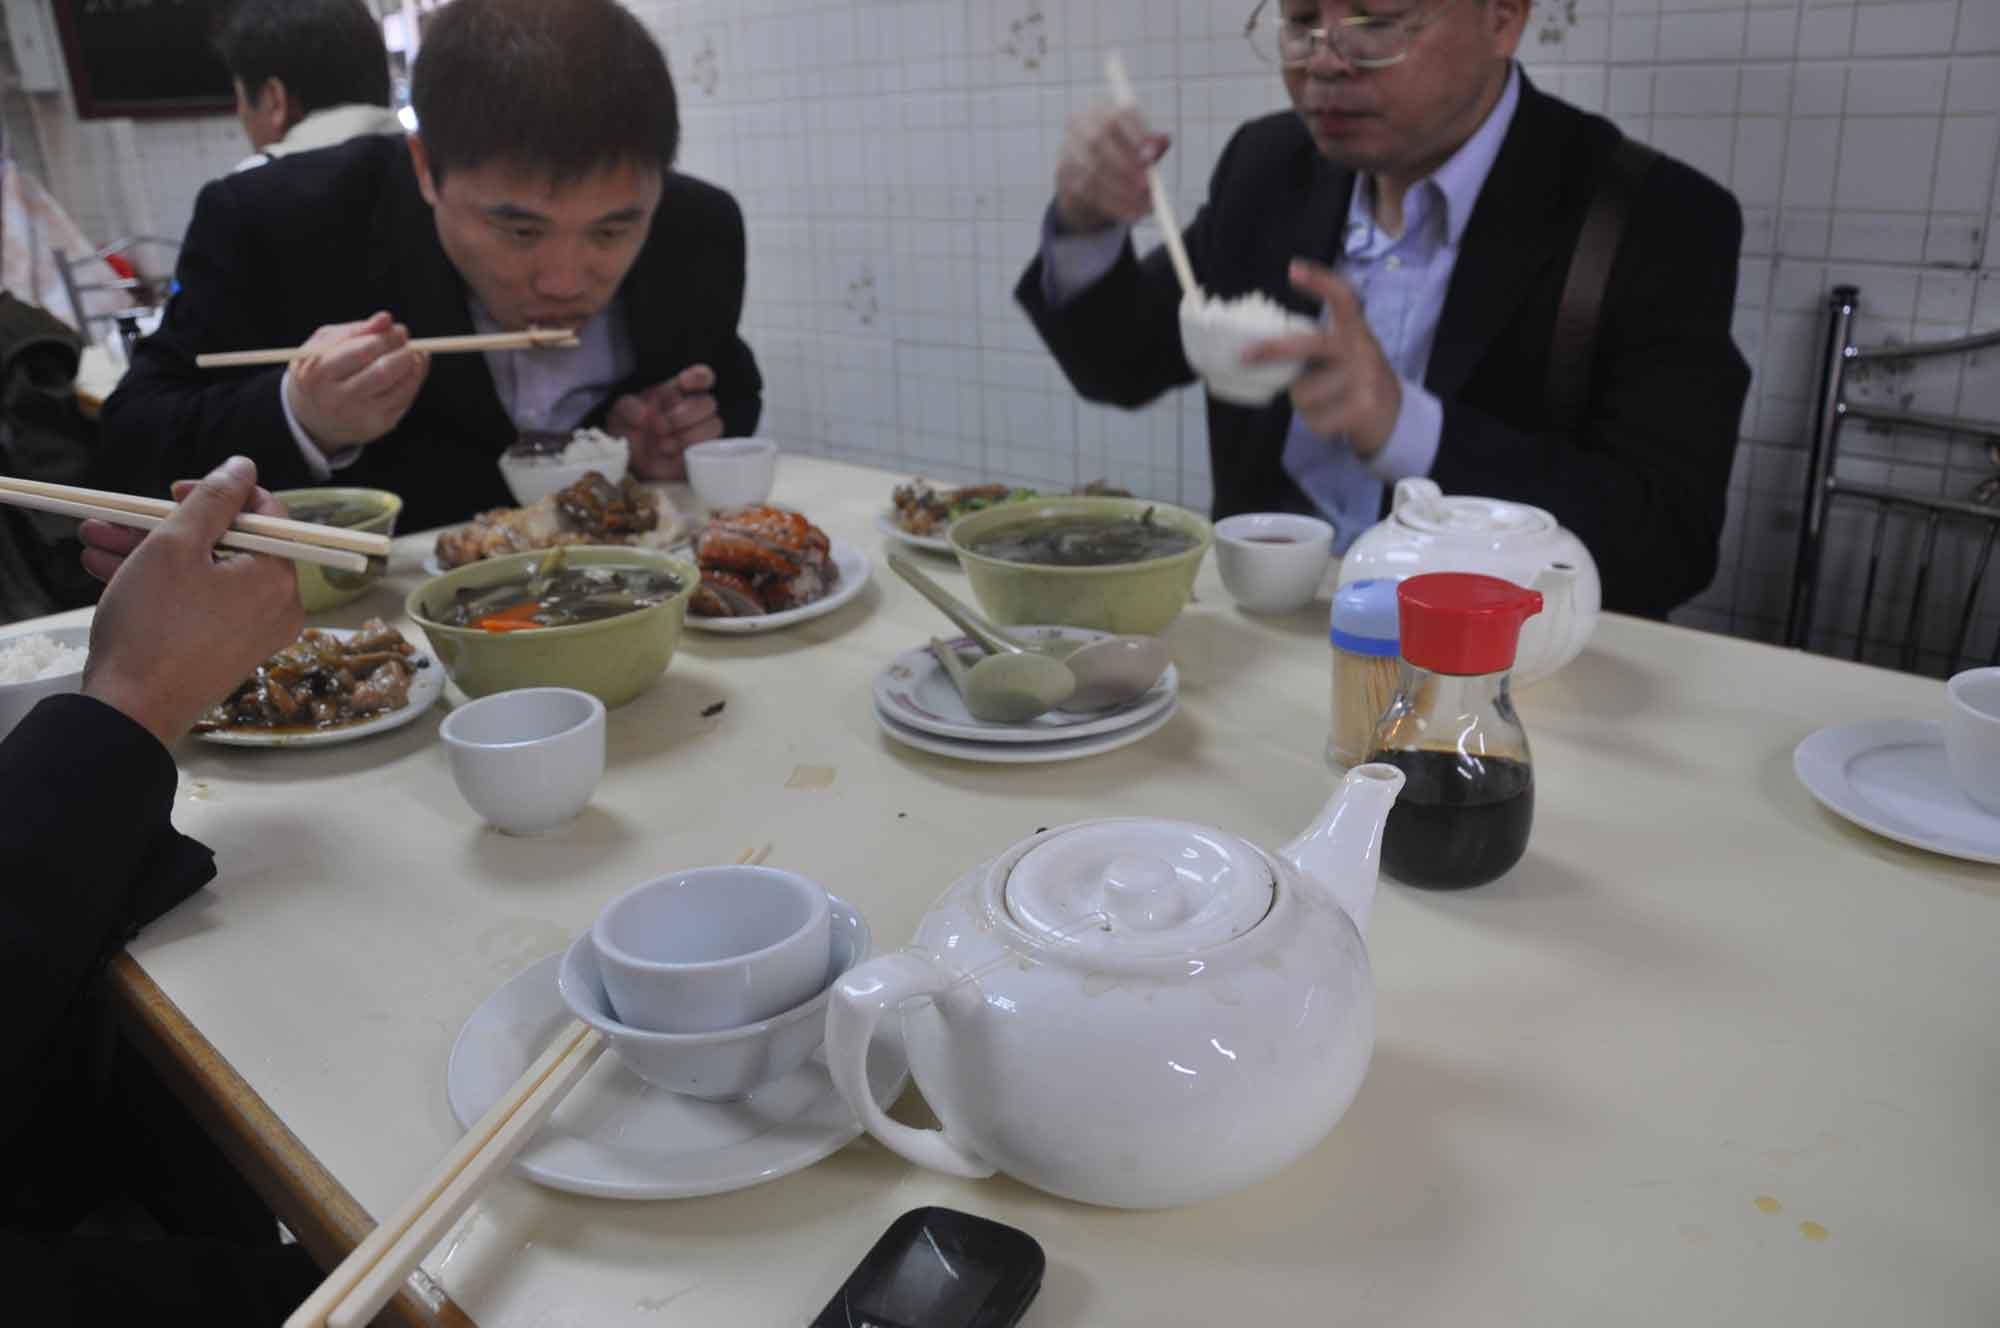 Hao Jing Fan Dian diners